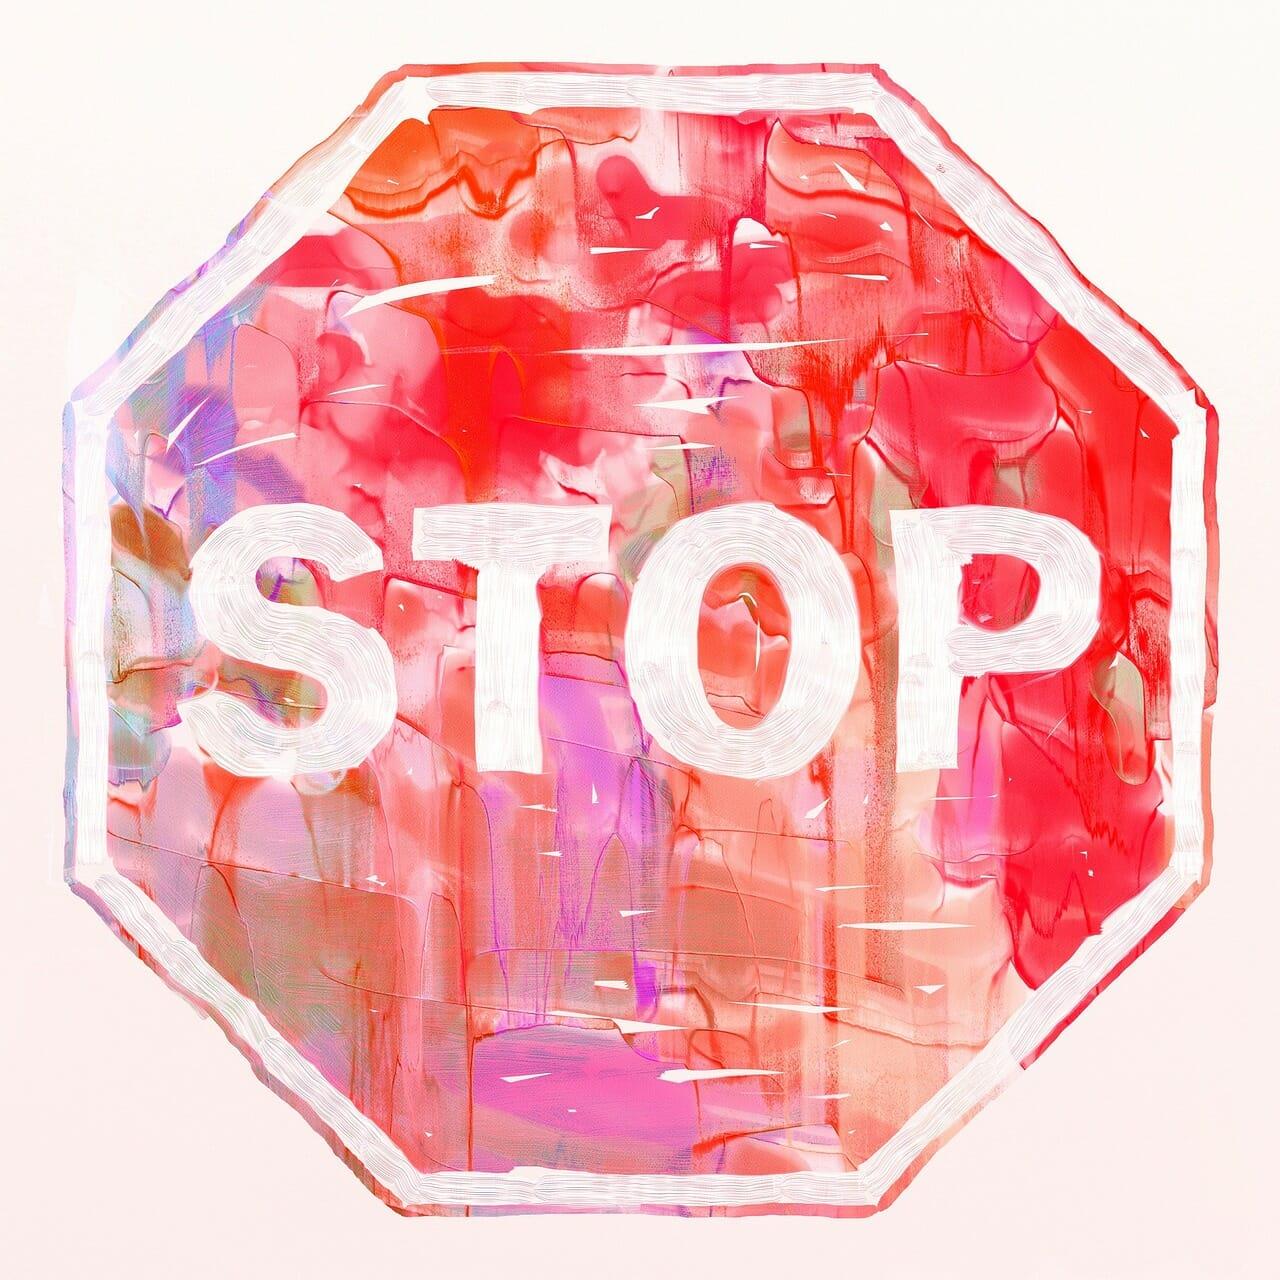 sosmisposo-cartello-stop